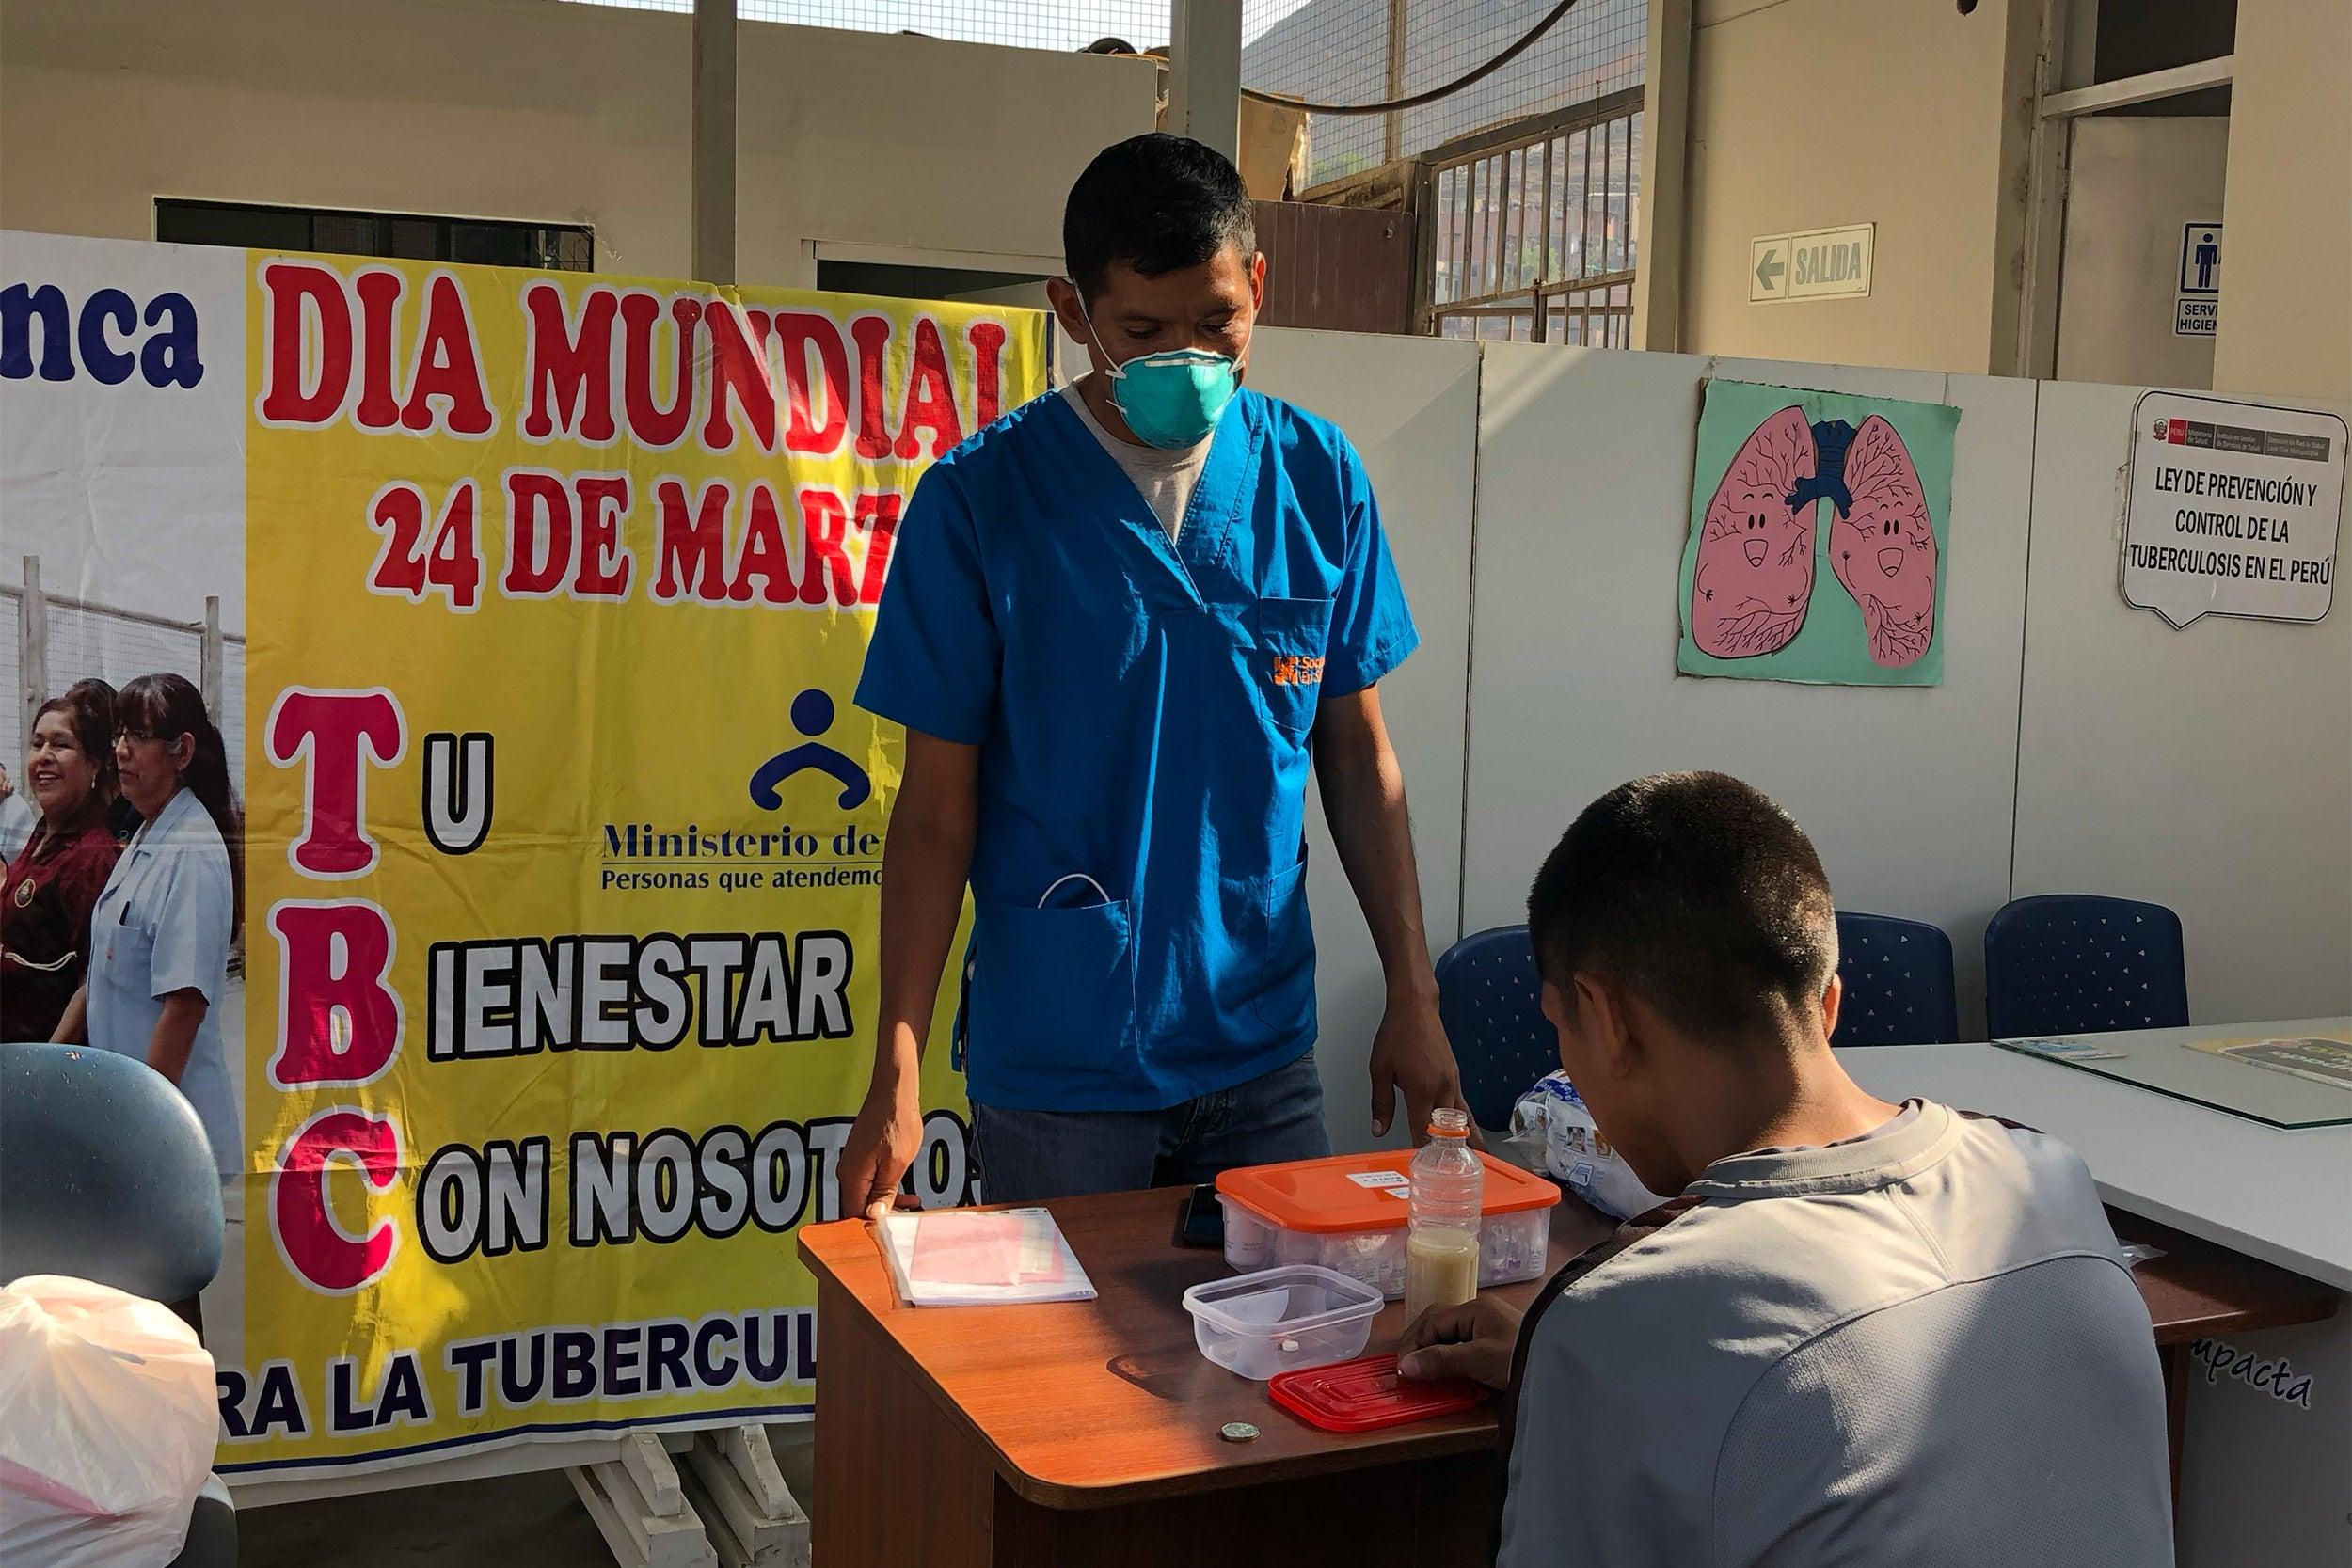 TV patient taking treatment.